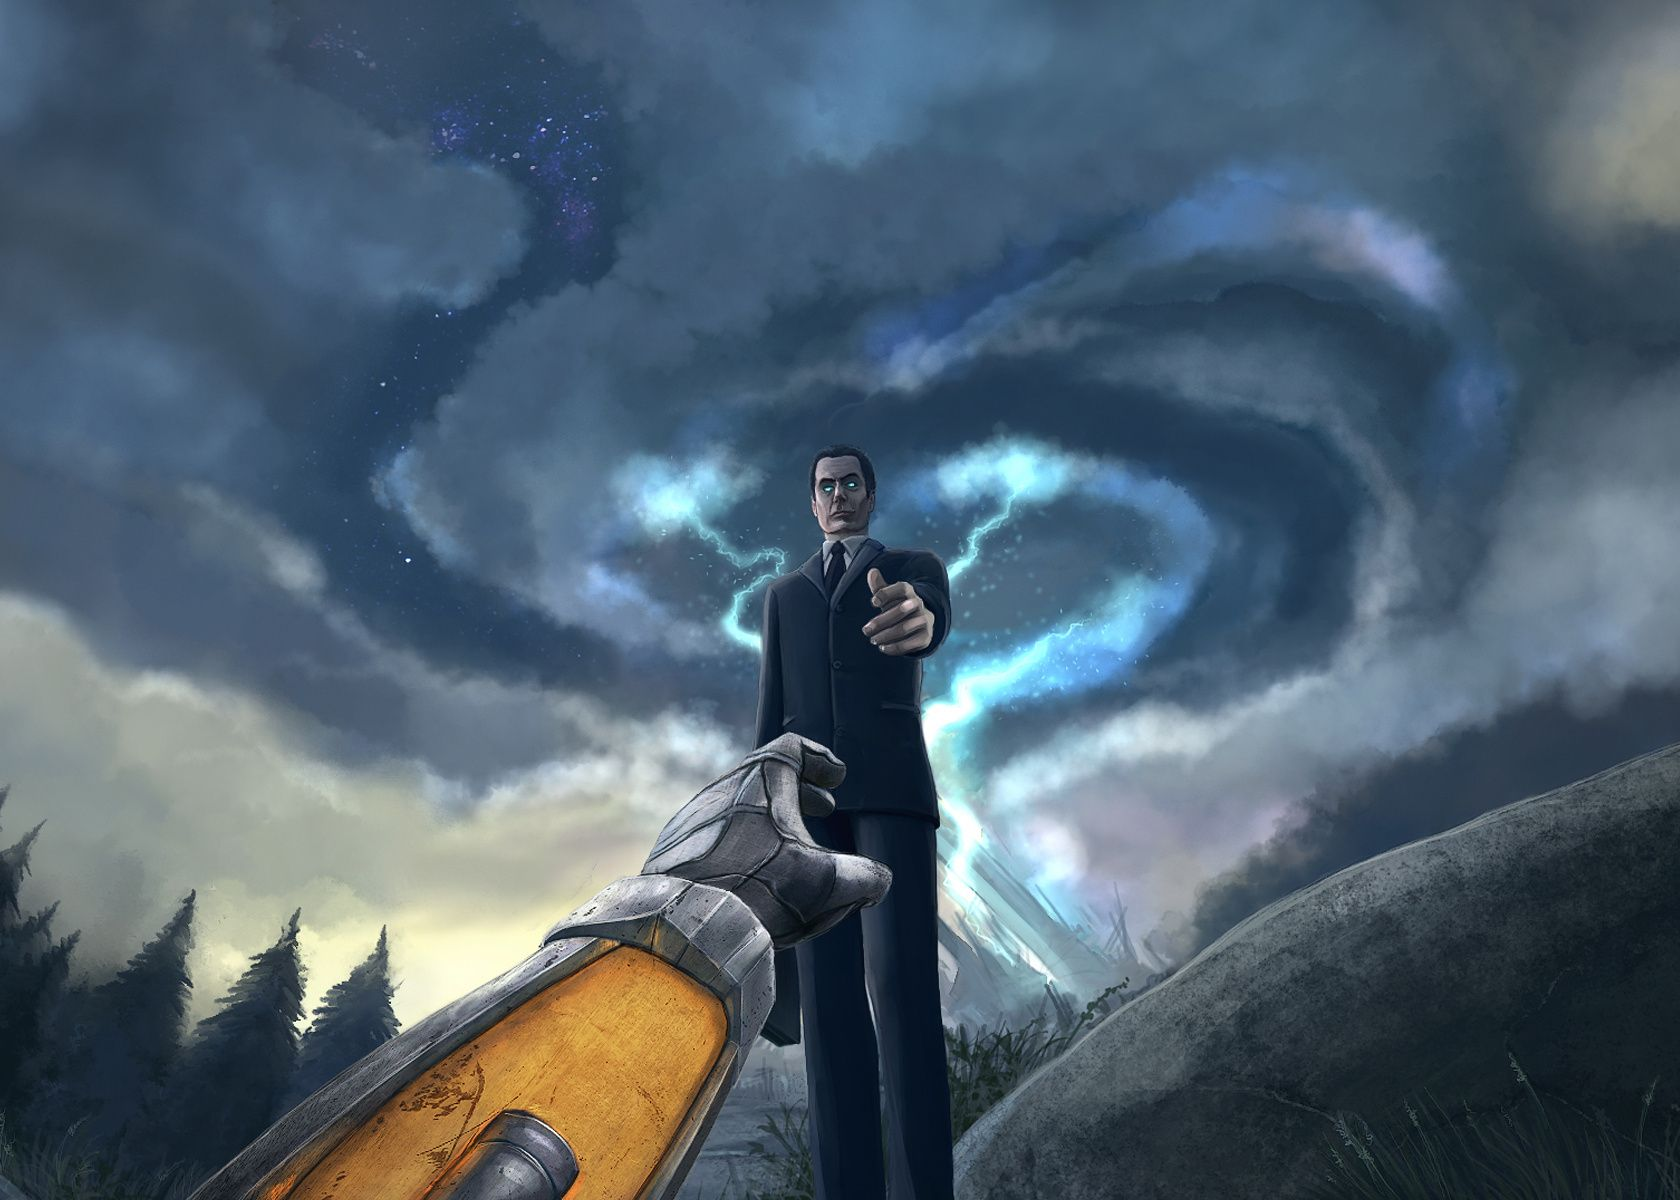 Half Life 2 Wallpapers   Top Half Life 2 Backgrounds 1680x1200